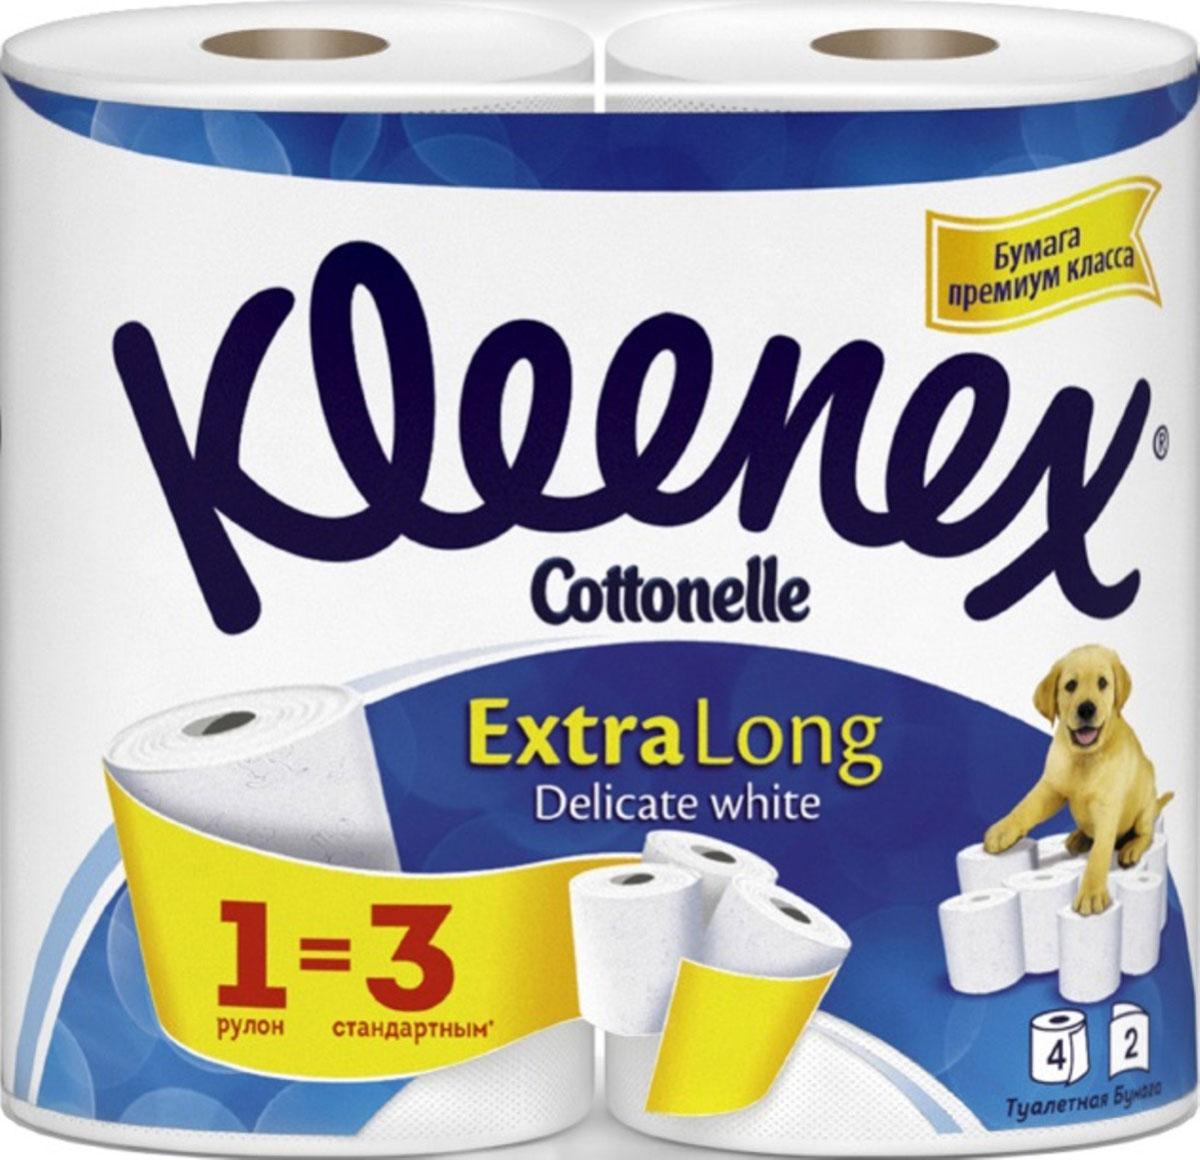 Kleenex Cottonelle Туалетная бумага Extra Long, двухслойная, цвет: белый, 4 рулона. 9450044 extra long carbon steel 11 bent needle nose pliers tool yellow